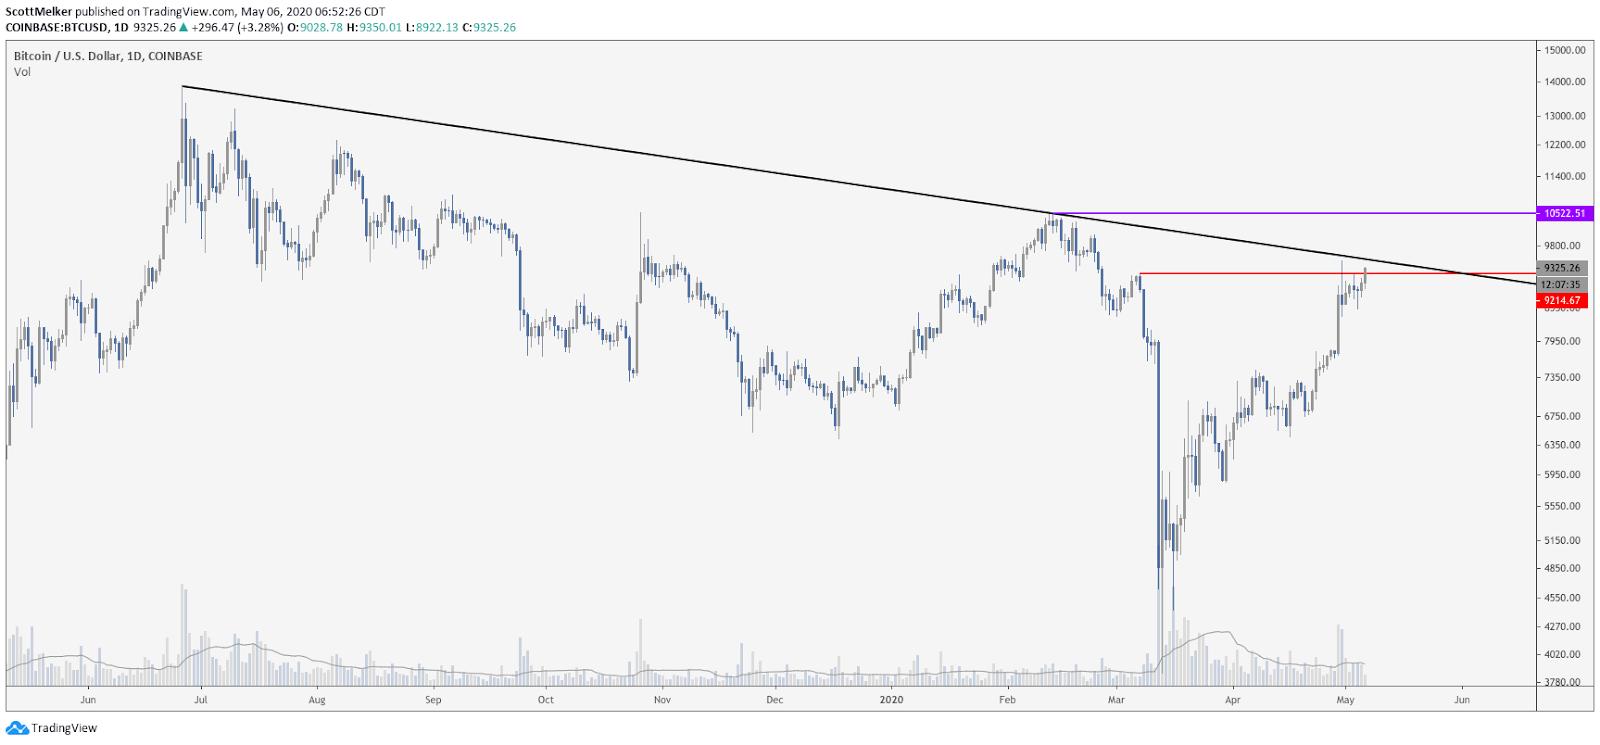 Bitcoin si avvicina a importanti resistenze